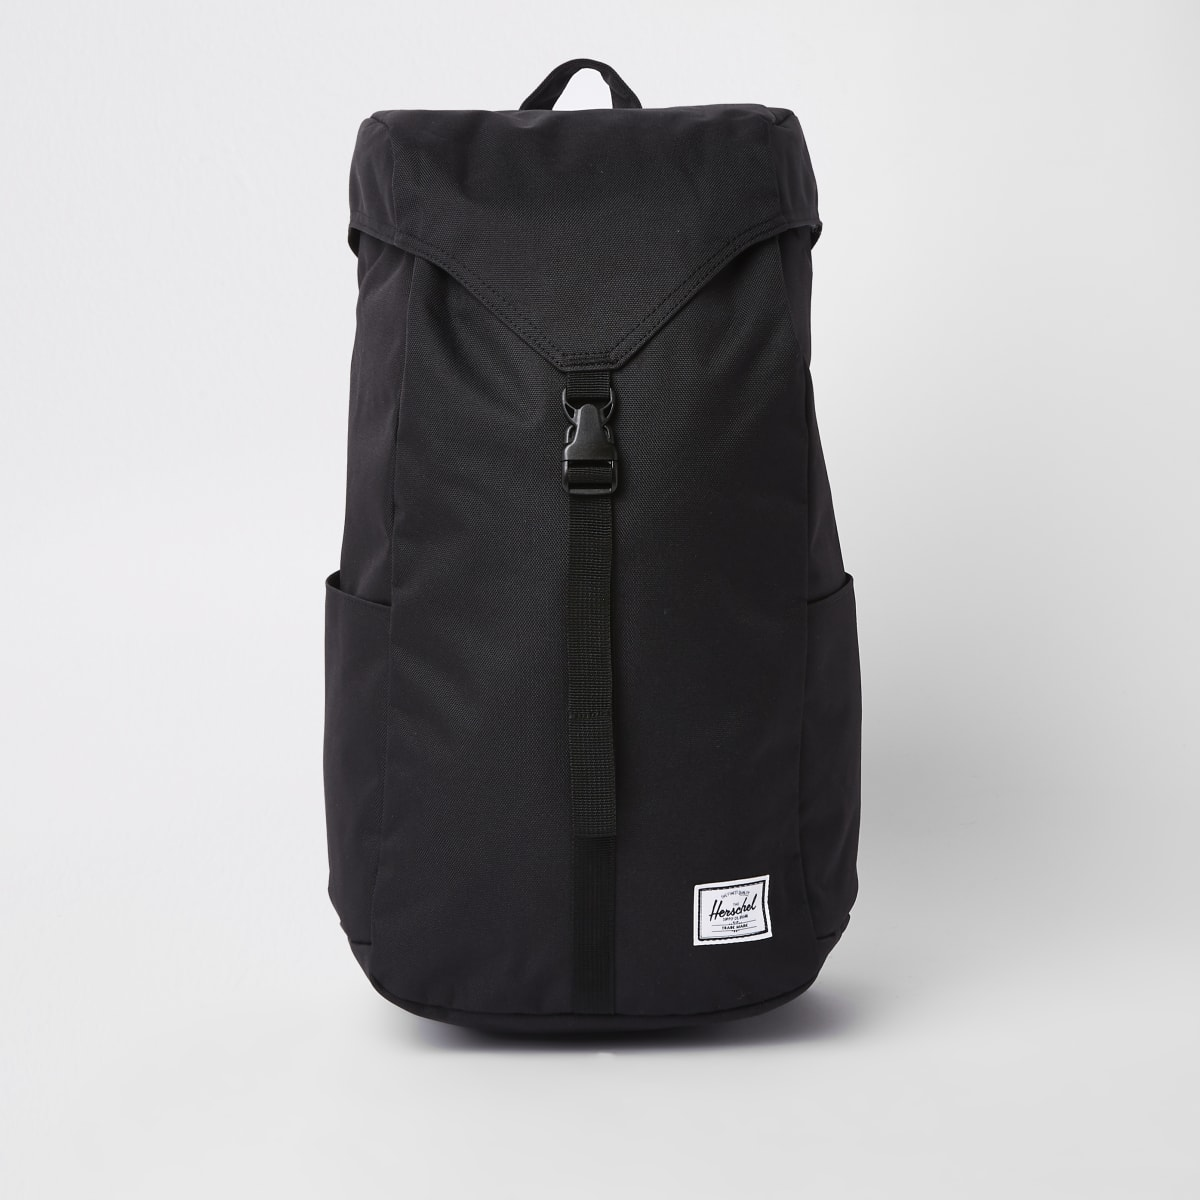 Herschel black Thompson backpack